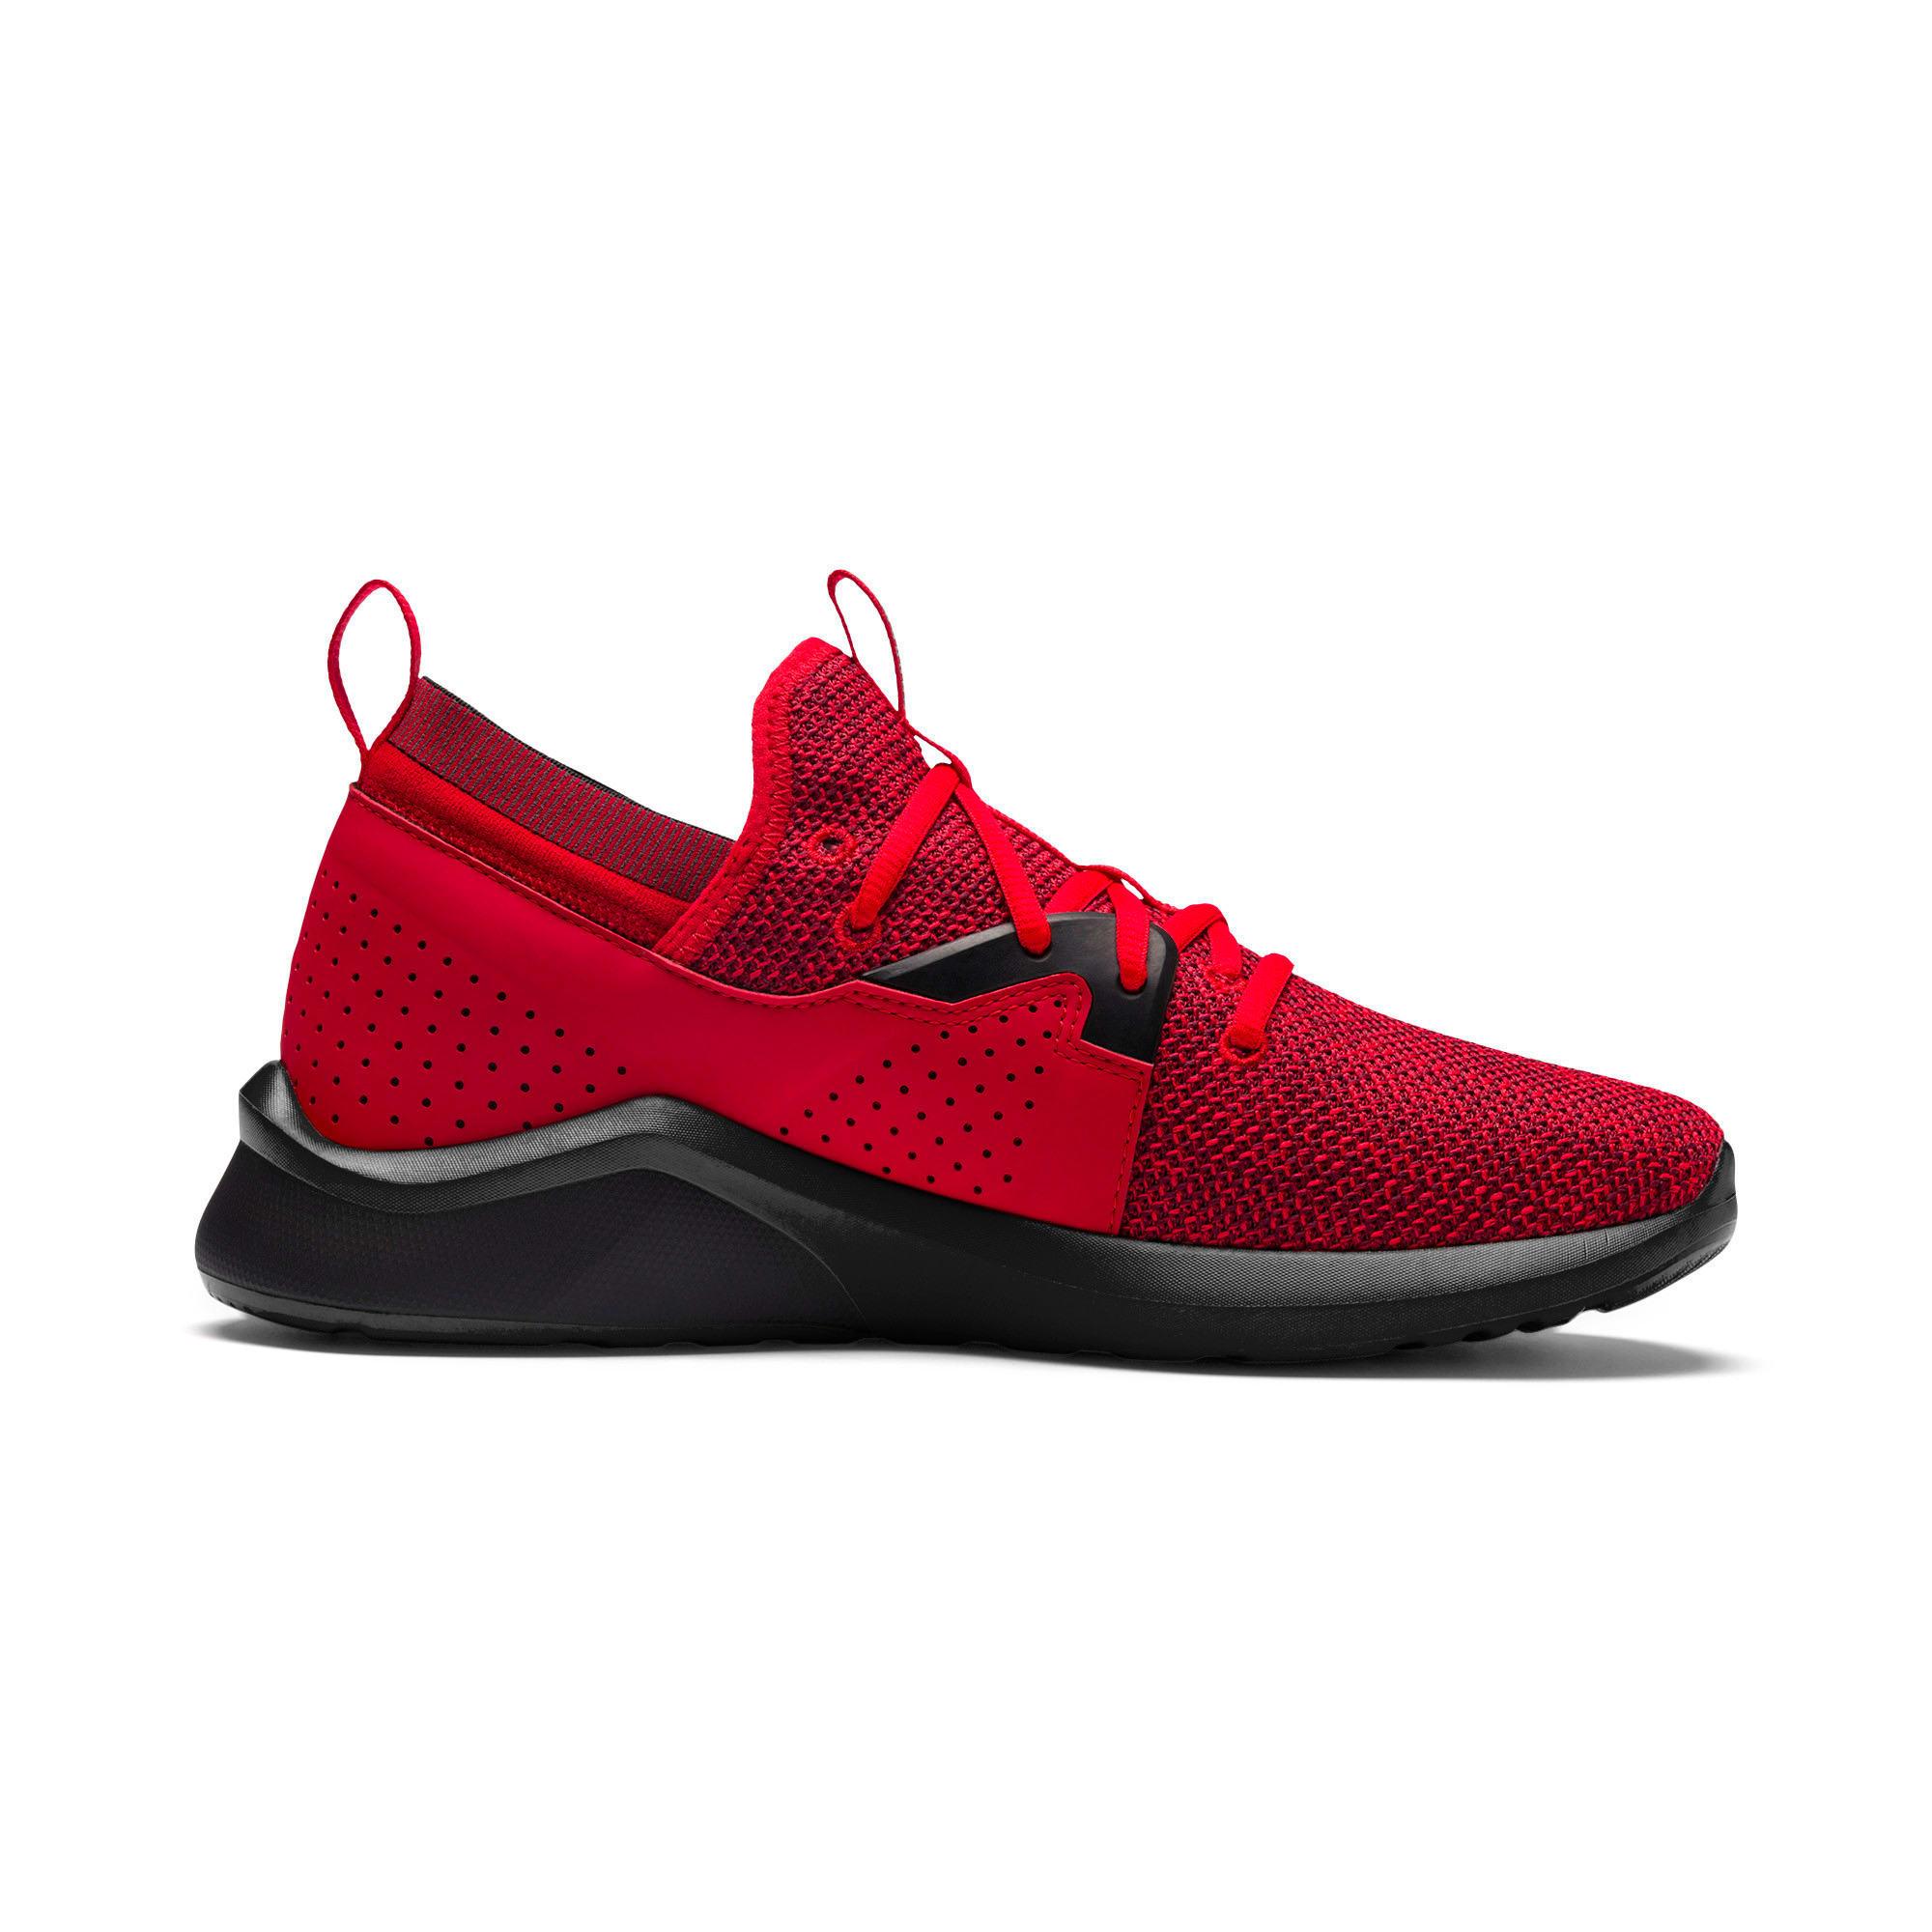 Thumbnail 5 of Emergence Men's Running Shoes, High Risk Red-Puma Black, medium-IND